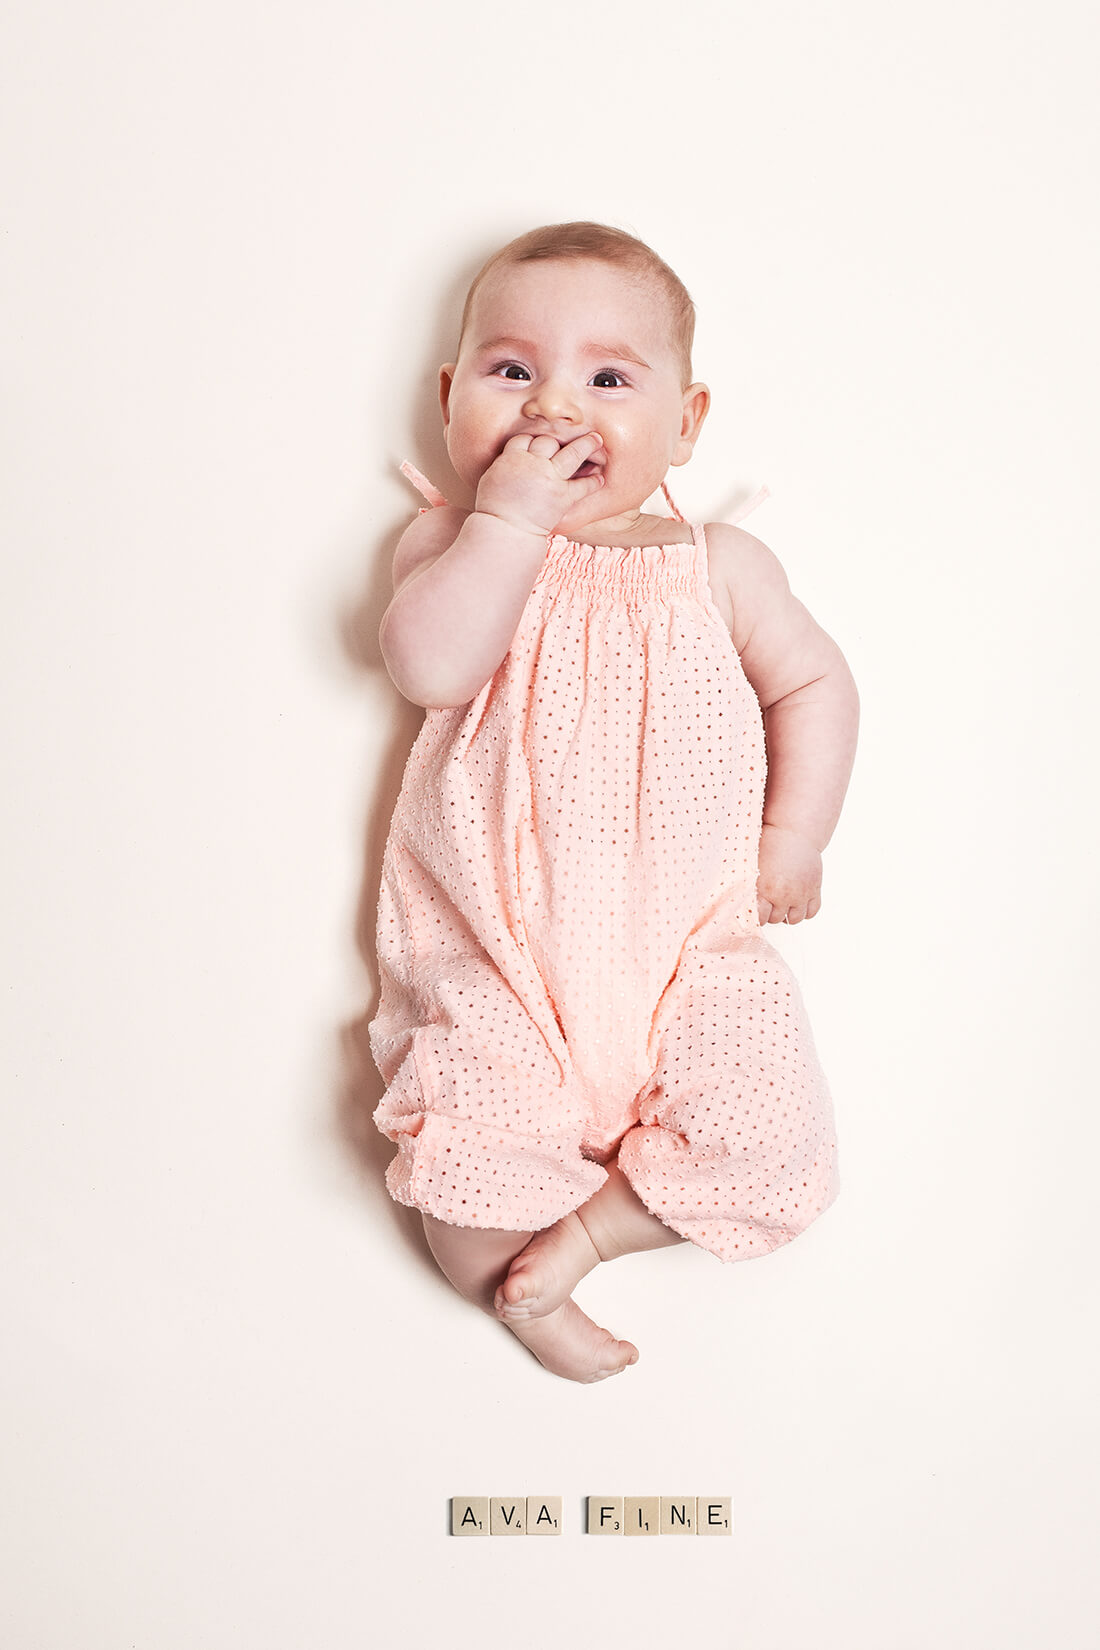 Babyportrait © Miriam Ellerbrake/ Little Monkey Fotografie 2015